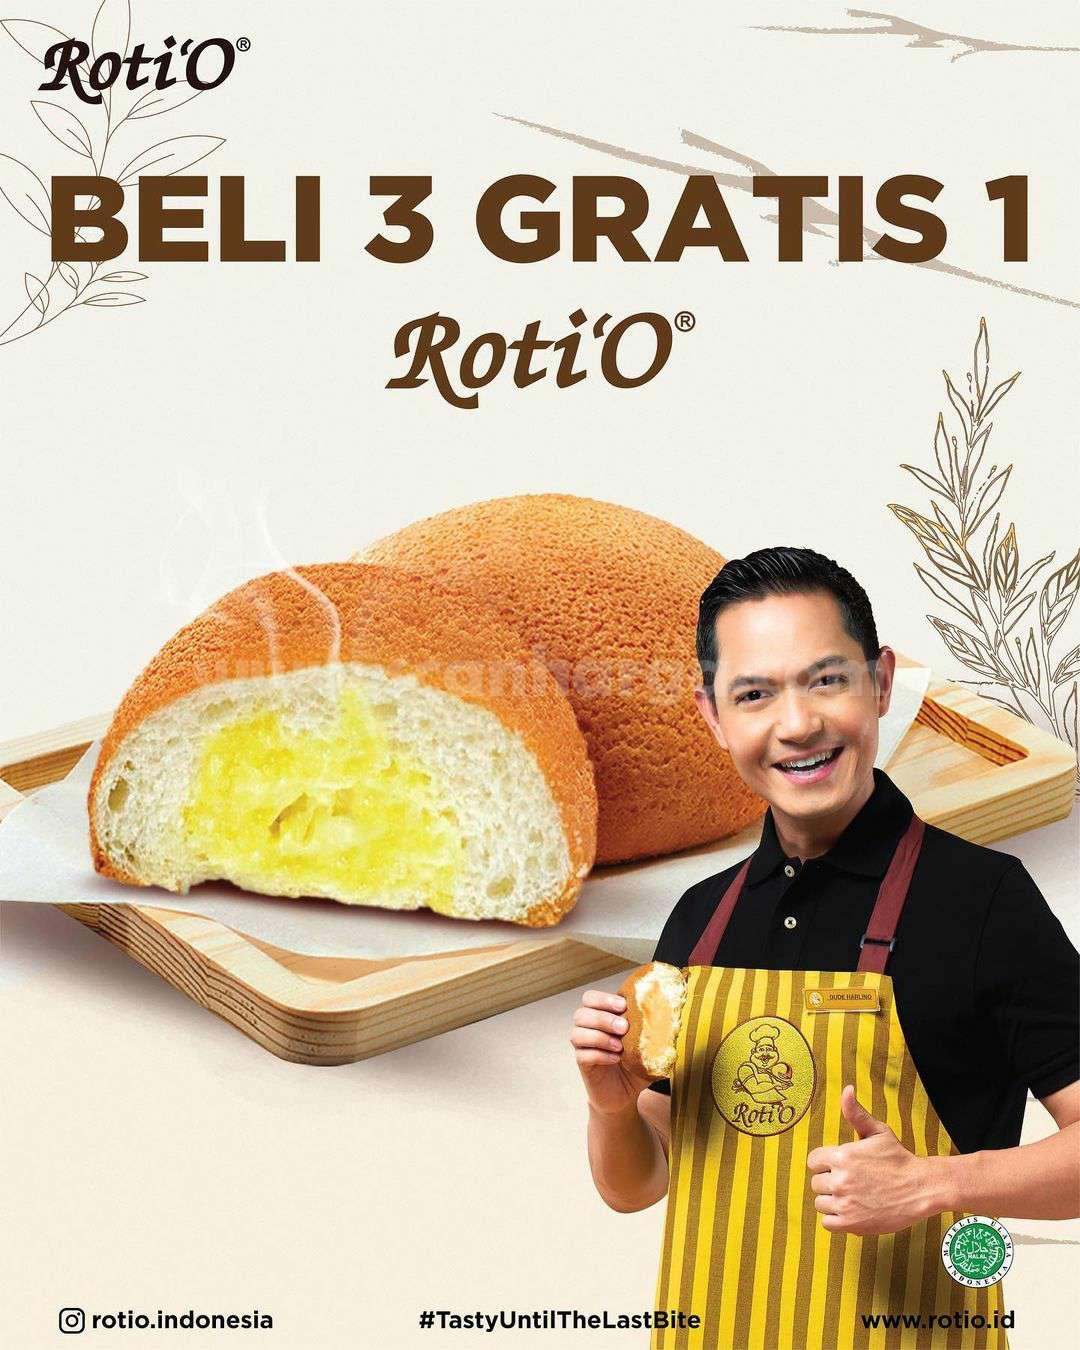 Promo Roti O Spesial Beli 3 Gratis 1 Roti'O Periode 1 - 30 September 2021